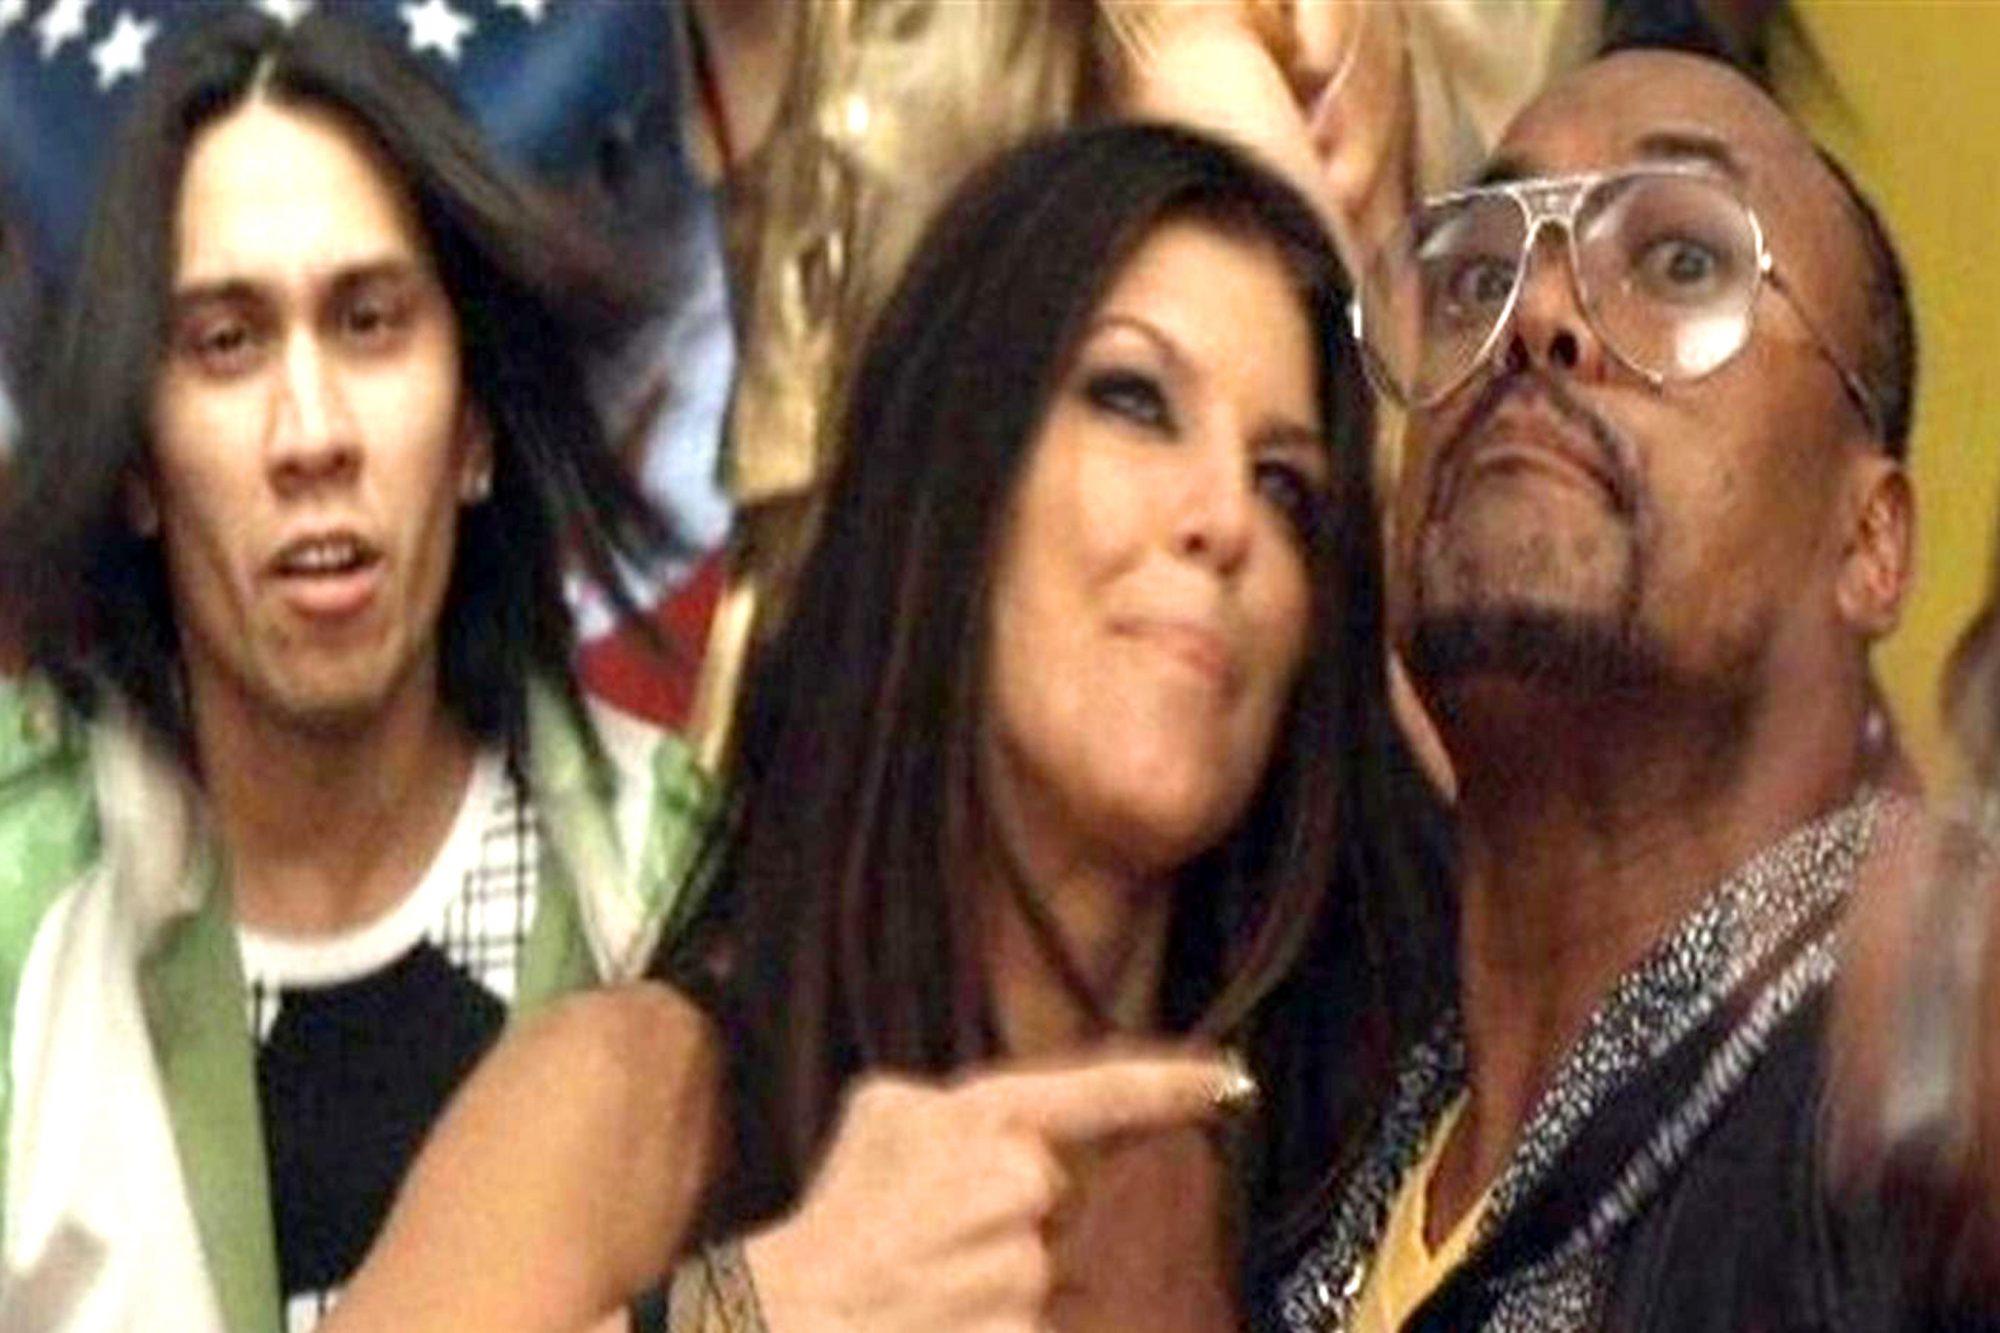 Black Eyed Peas, I Gotta Feeling,